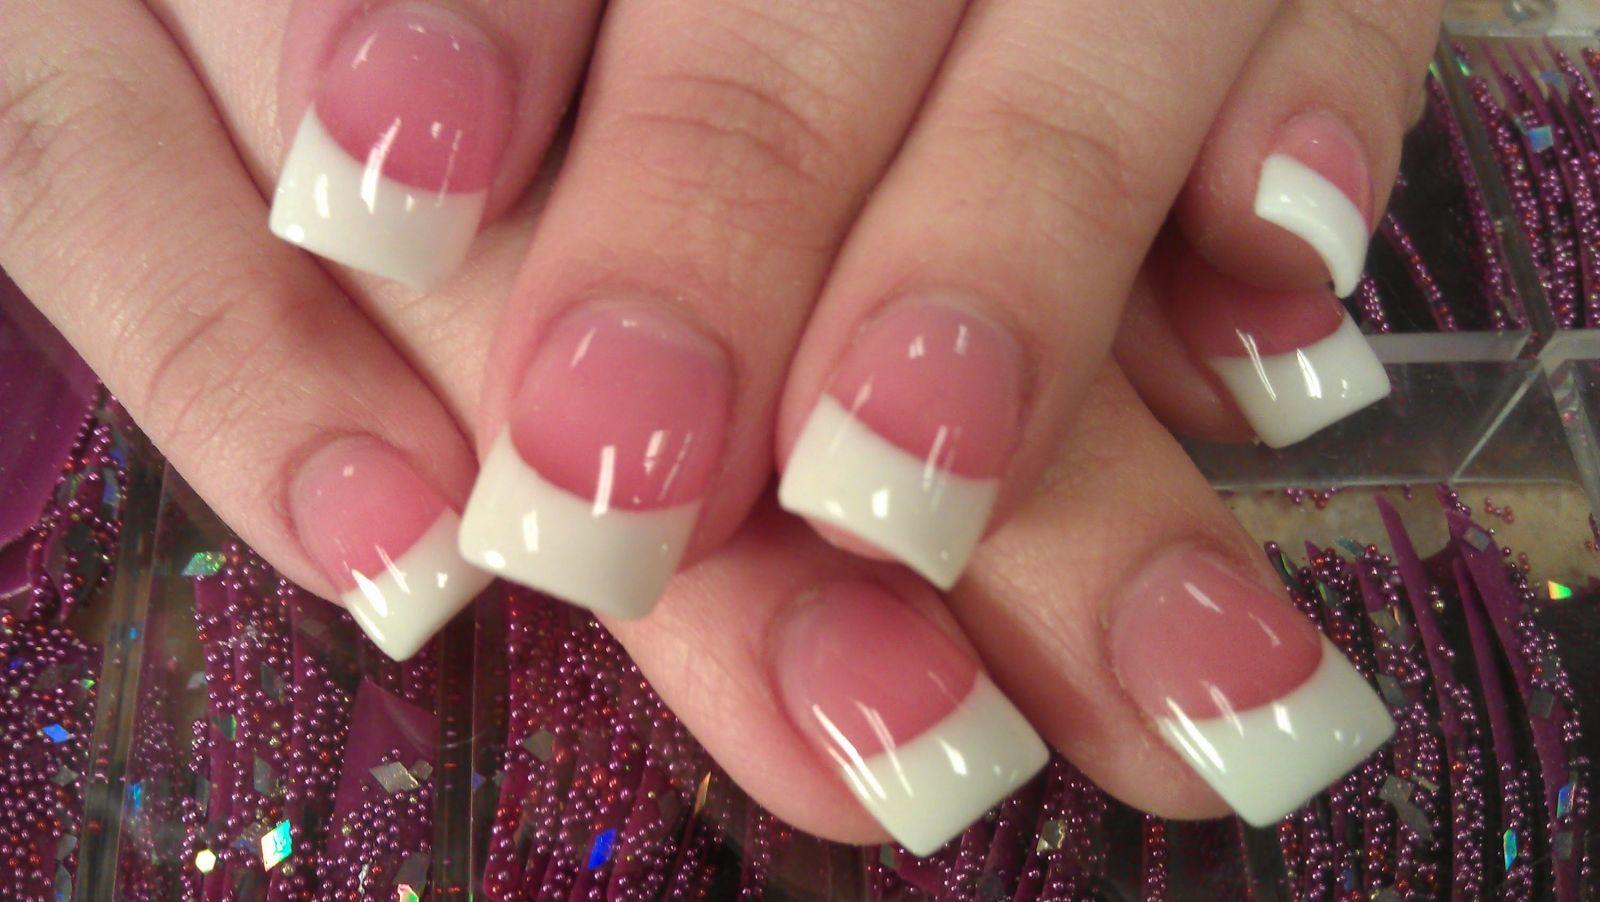 Acrylic Nails | Blog | MobileSalon.com